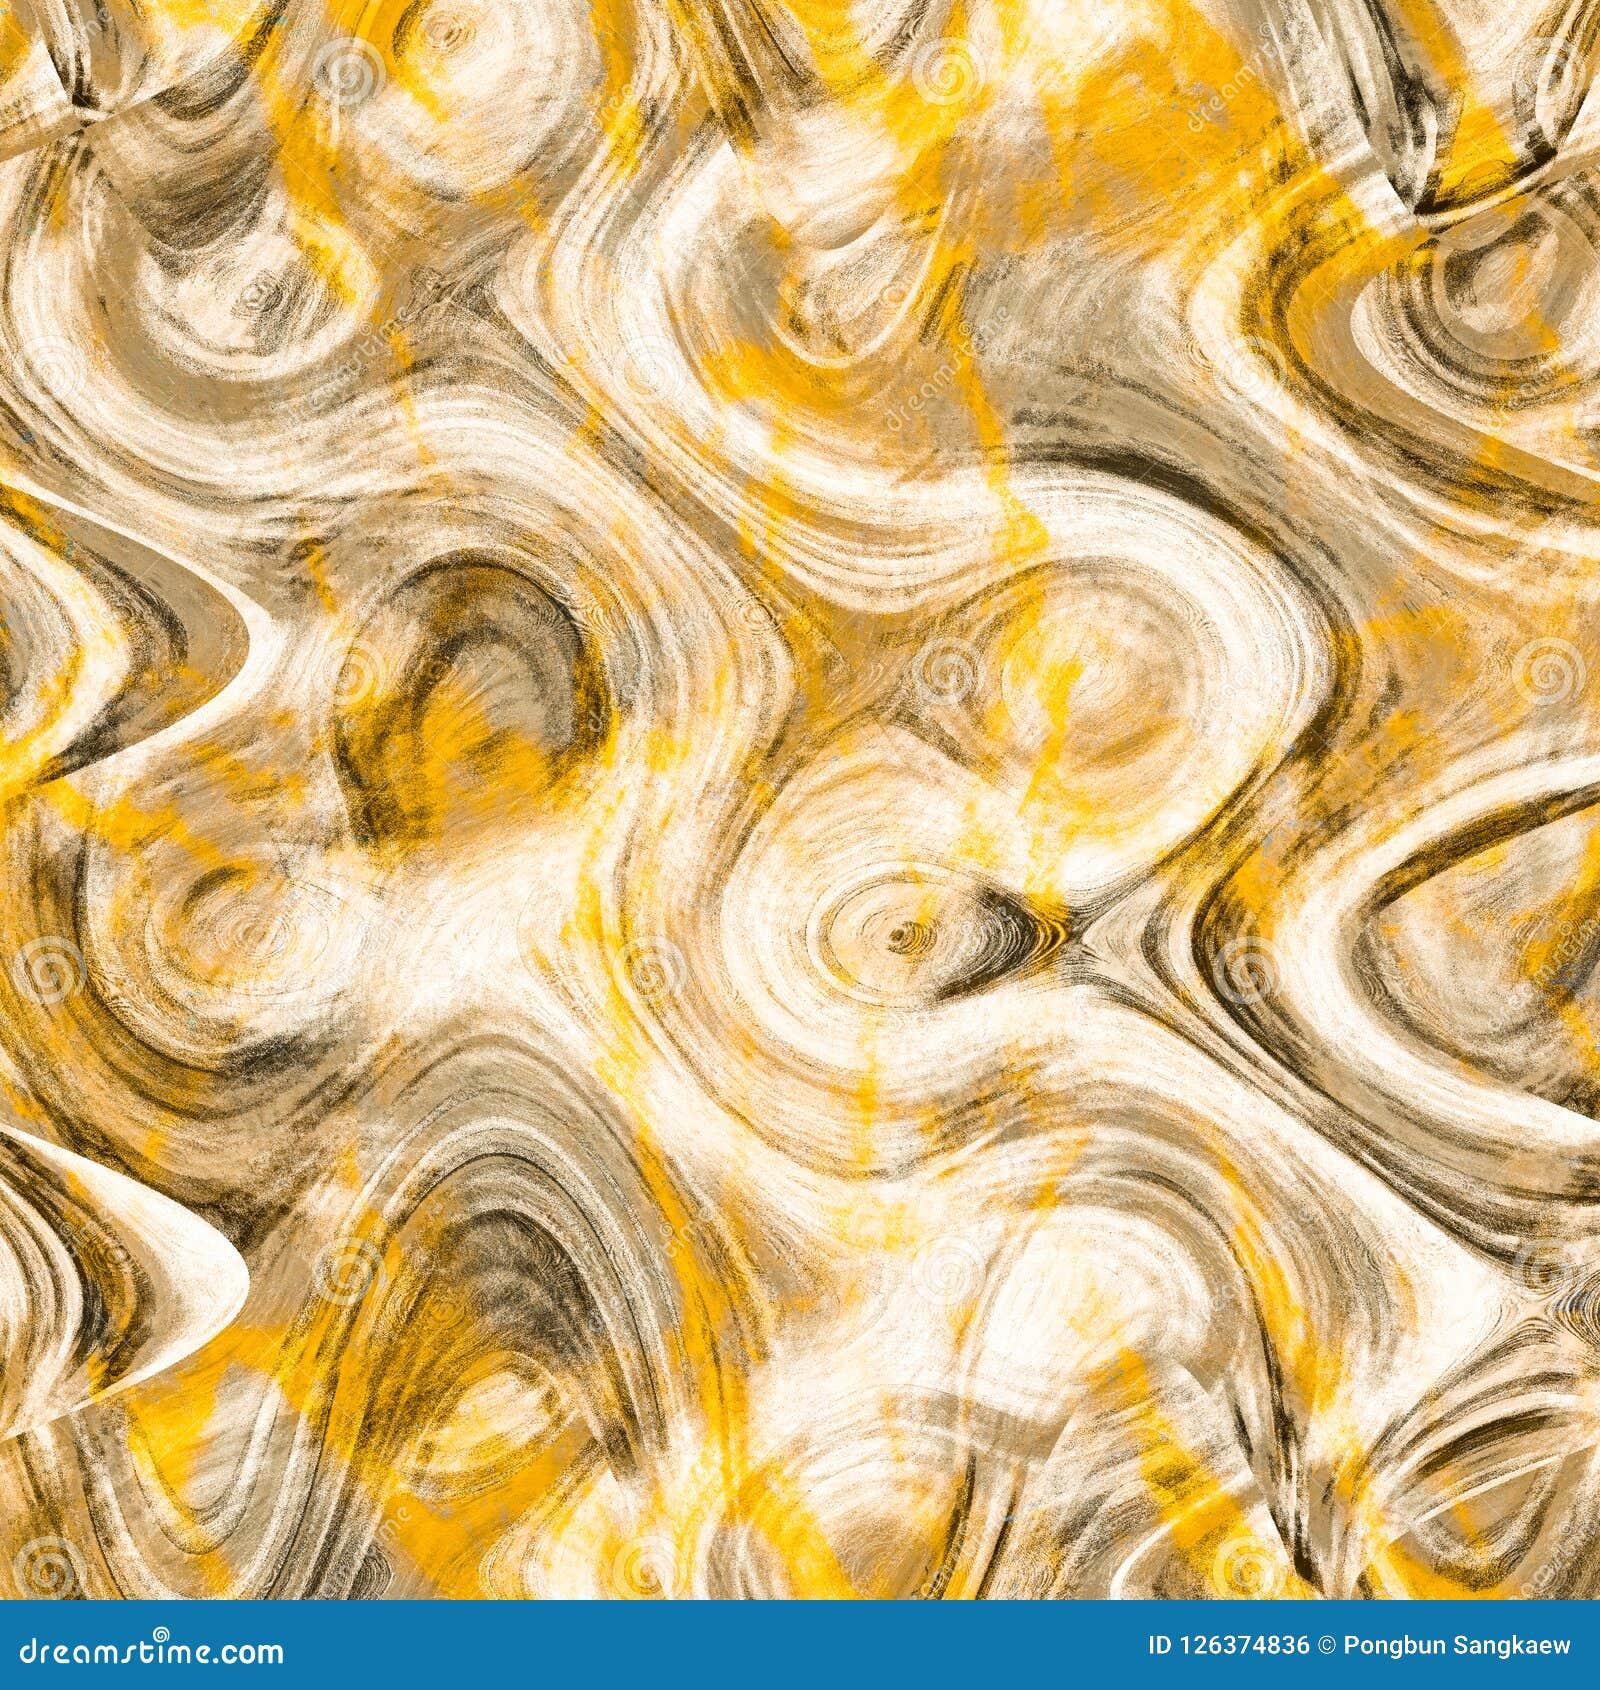 Grunge Gray And Gold Abstract Wallpaper Modern Art